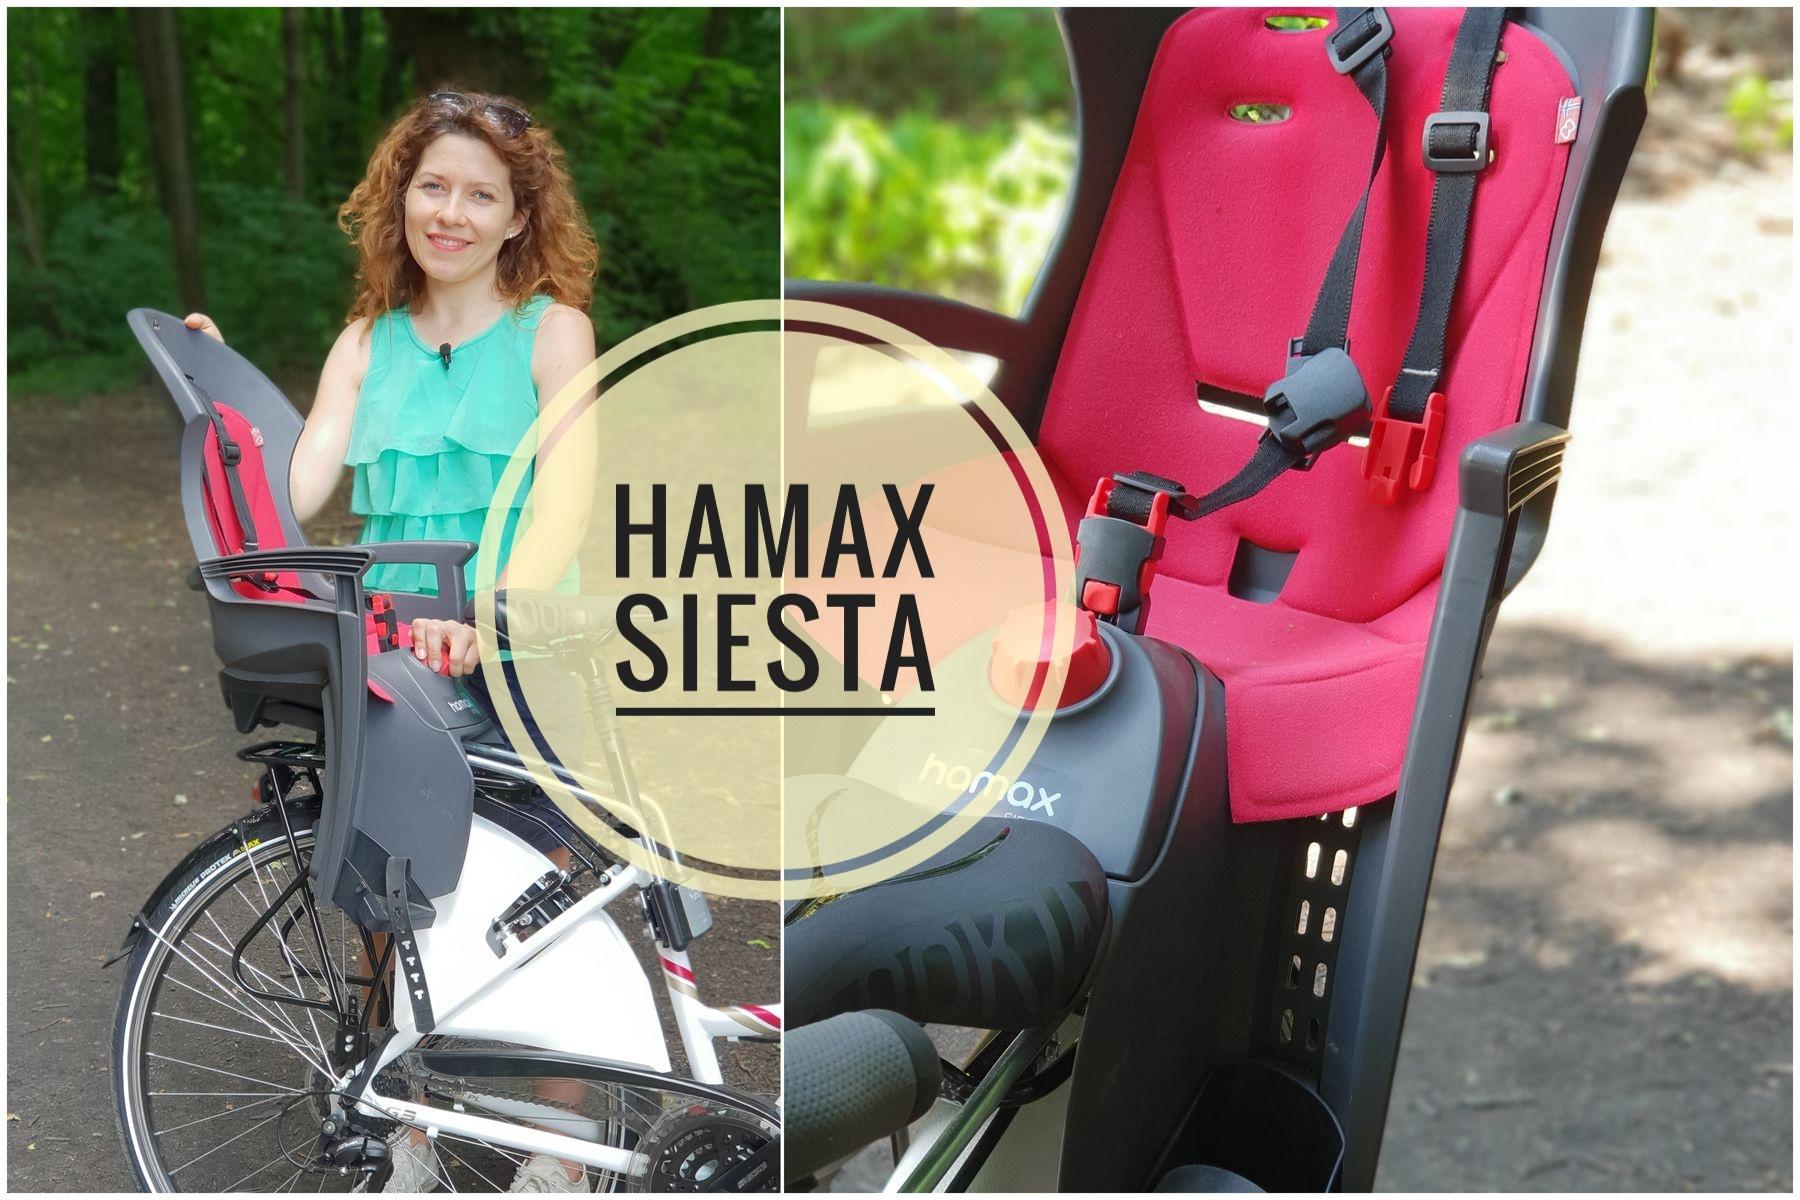 Hamax Siesta